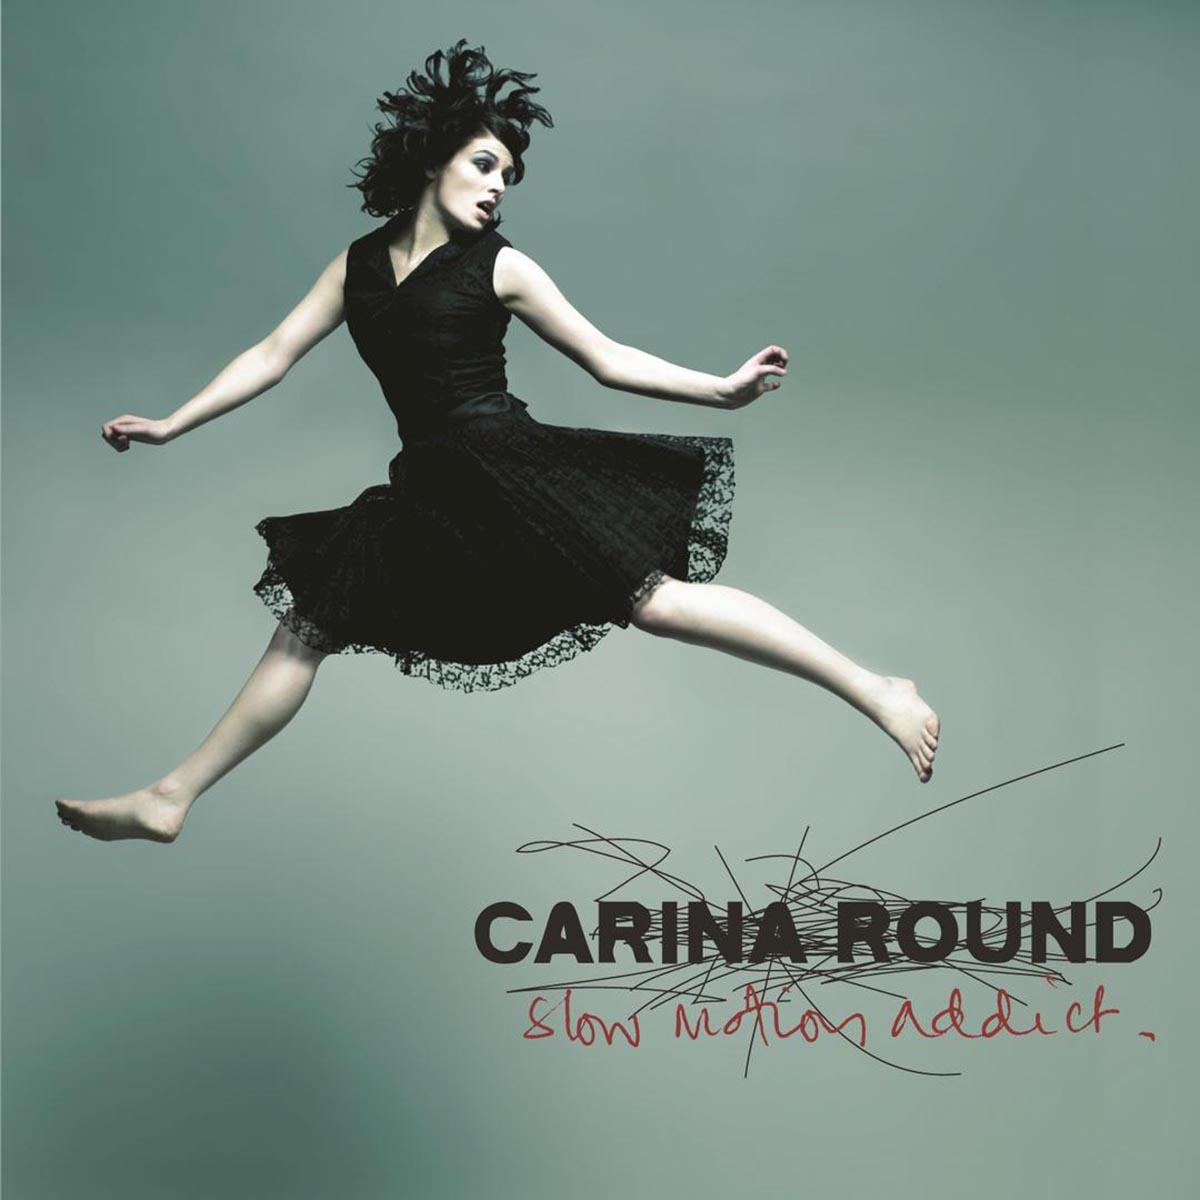 Carina Round, Slow Motion Addict